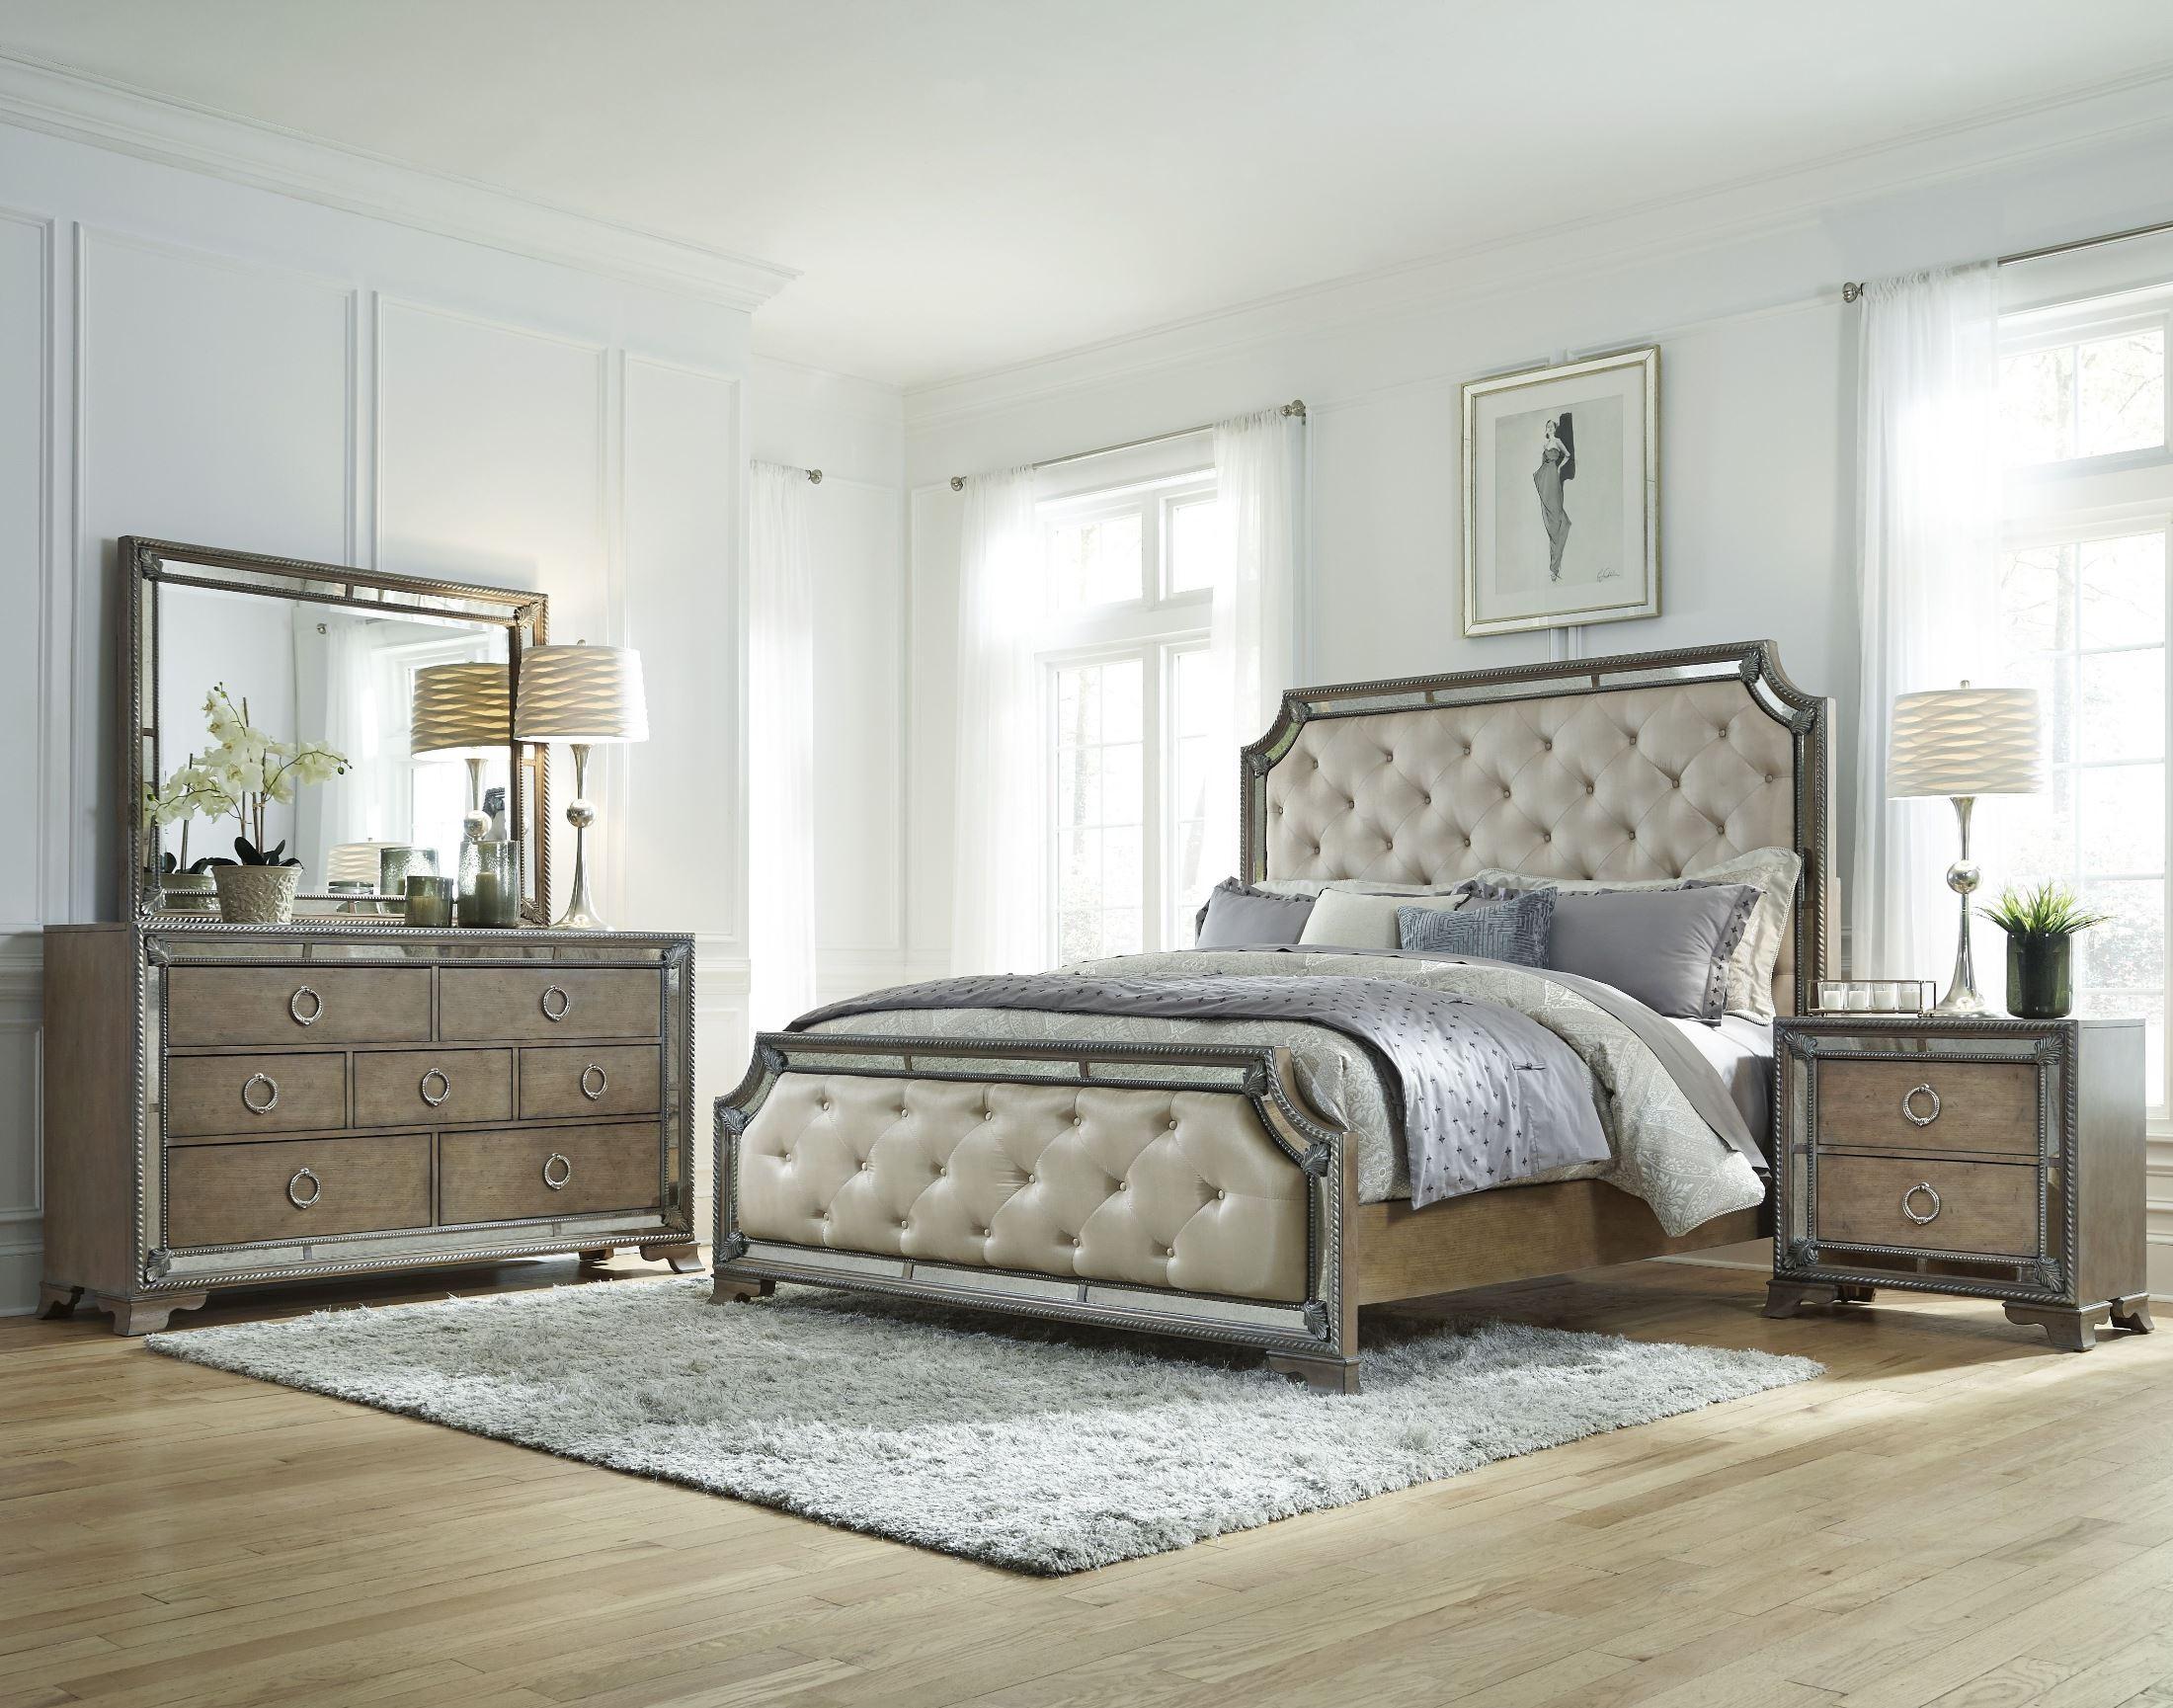 Karissa Light Wood Upholstered Panel Bedroom Set from ...